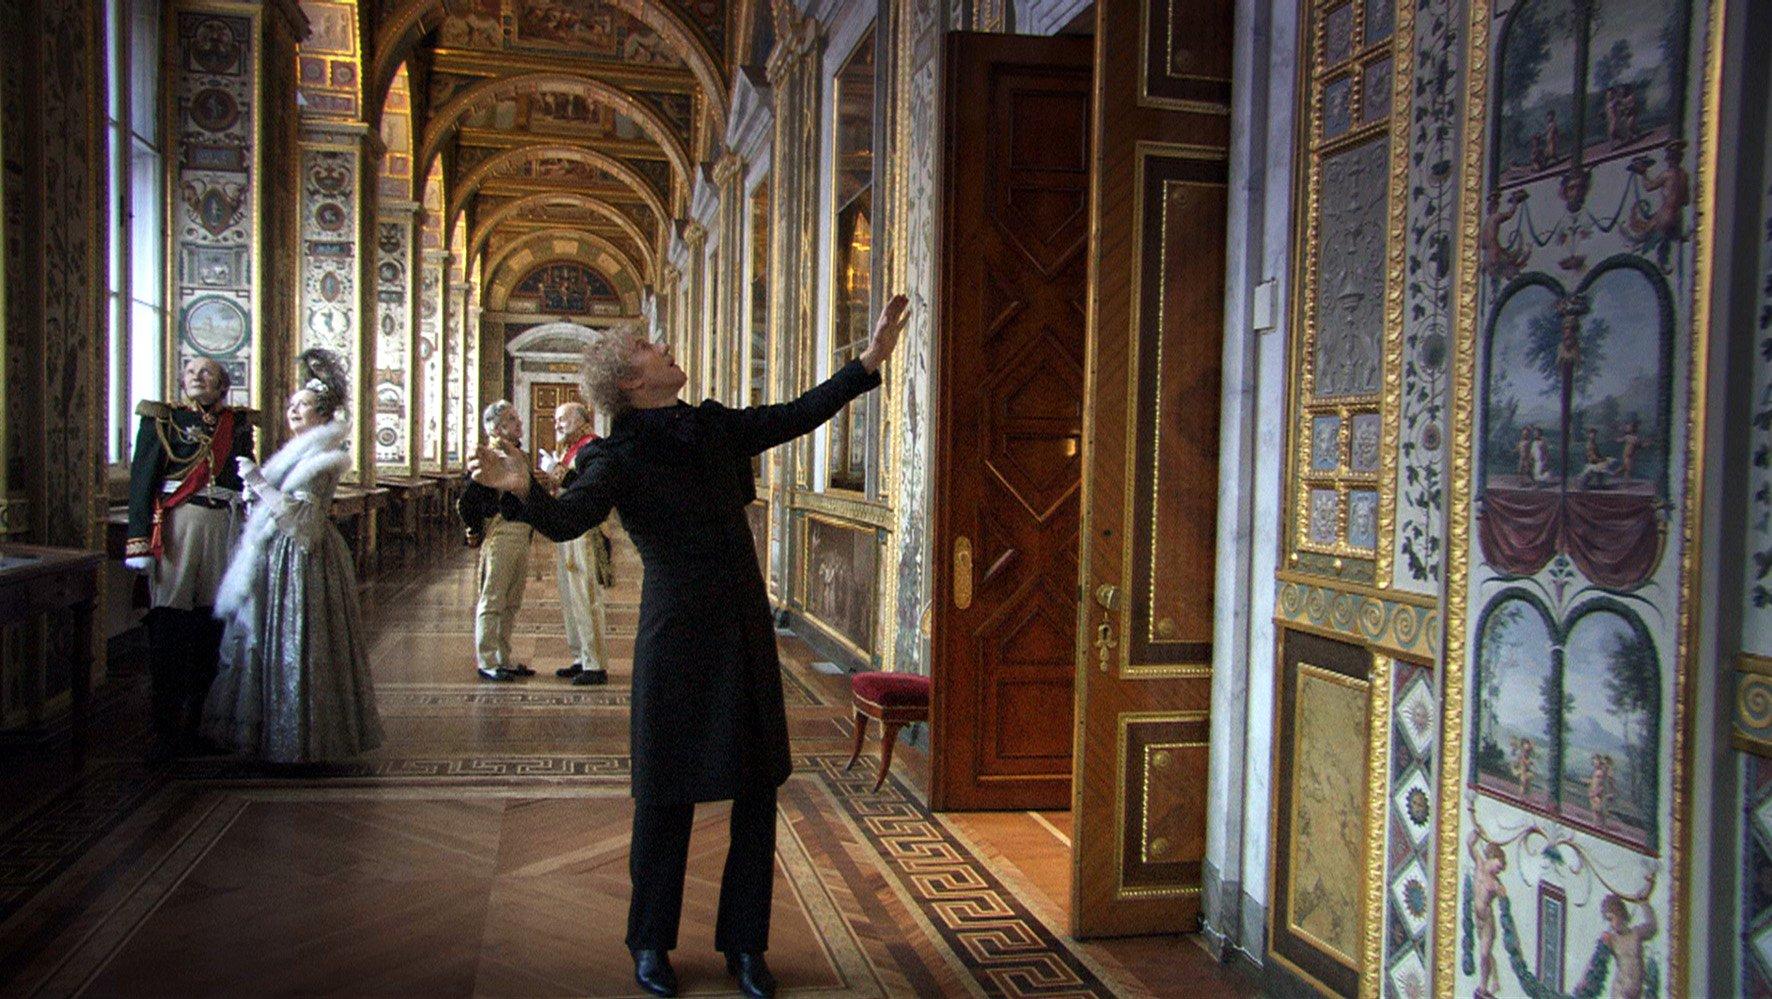 Alexander Sokurov's single-take film,   Russian Ark